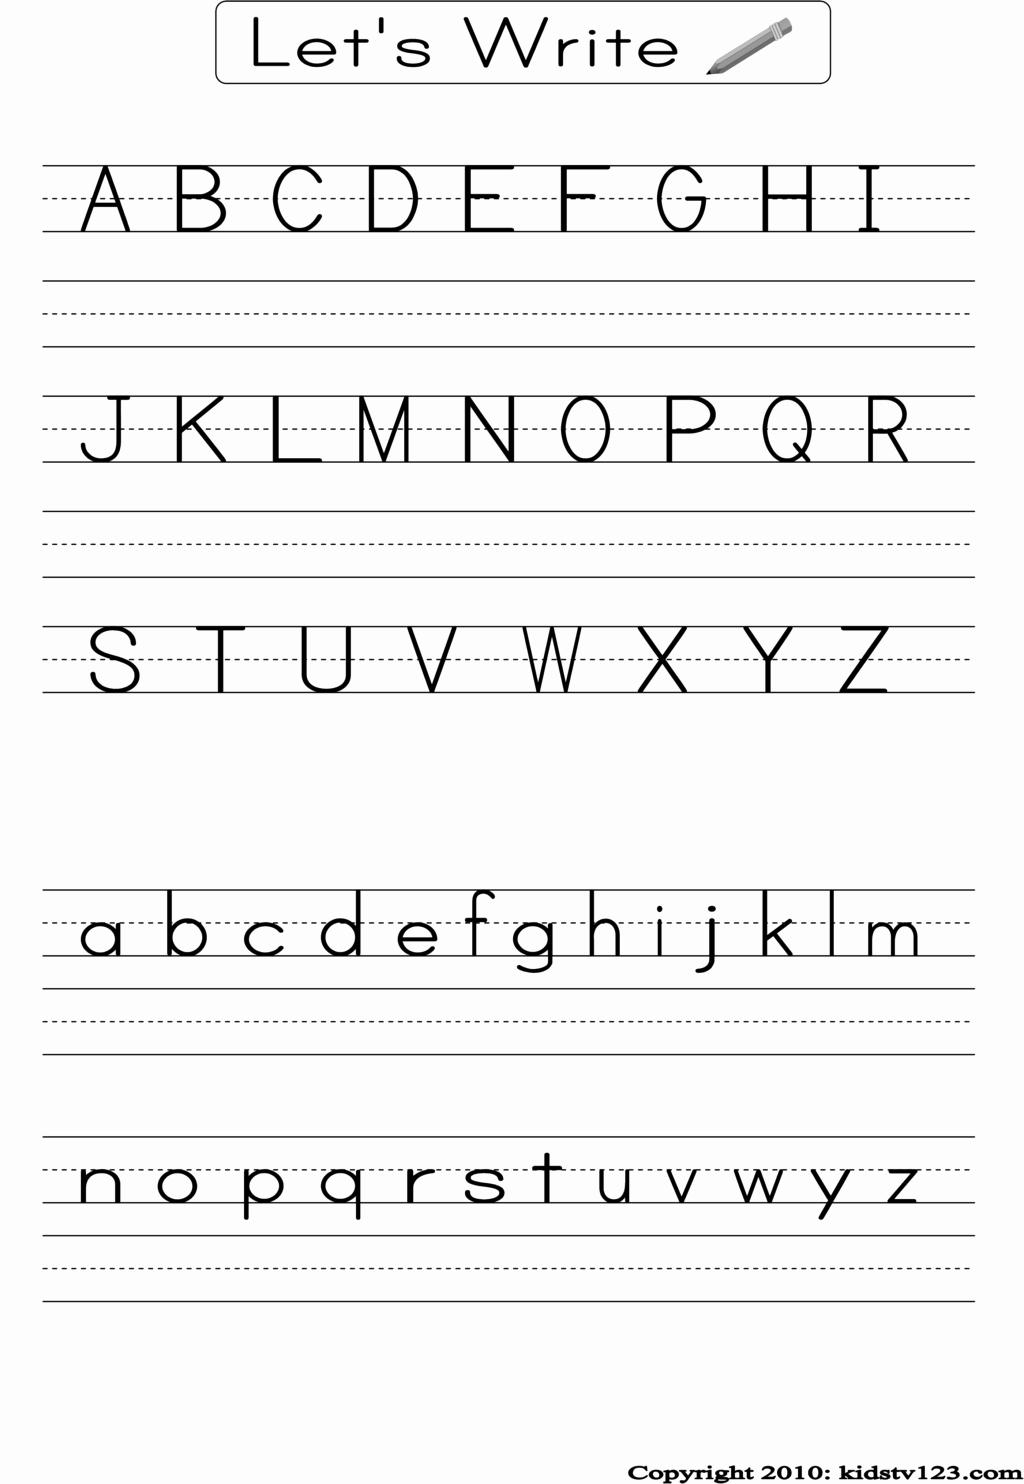 Alphabet Tracing Worksheets Pdf Lovely Handwriting Worksheet Pdf 5 Free Handwriting Practice